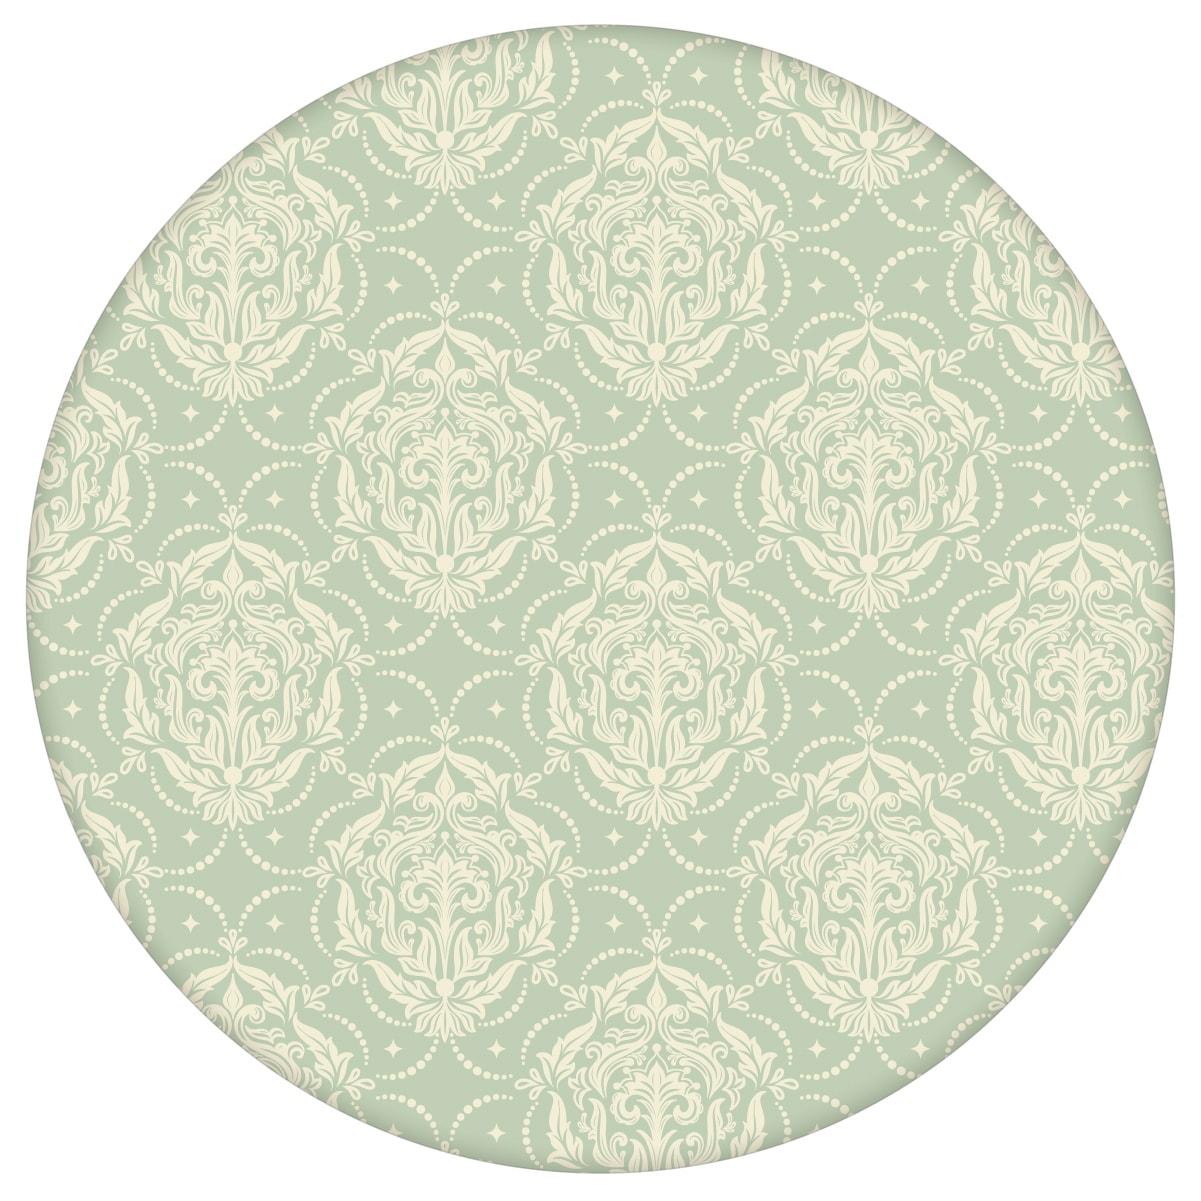 Mint Ornamenttapete My Castle Damast Muster, Design Tapete als Wandgestaltung